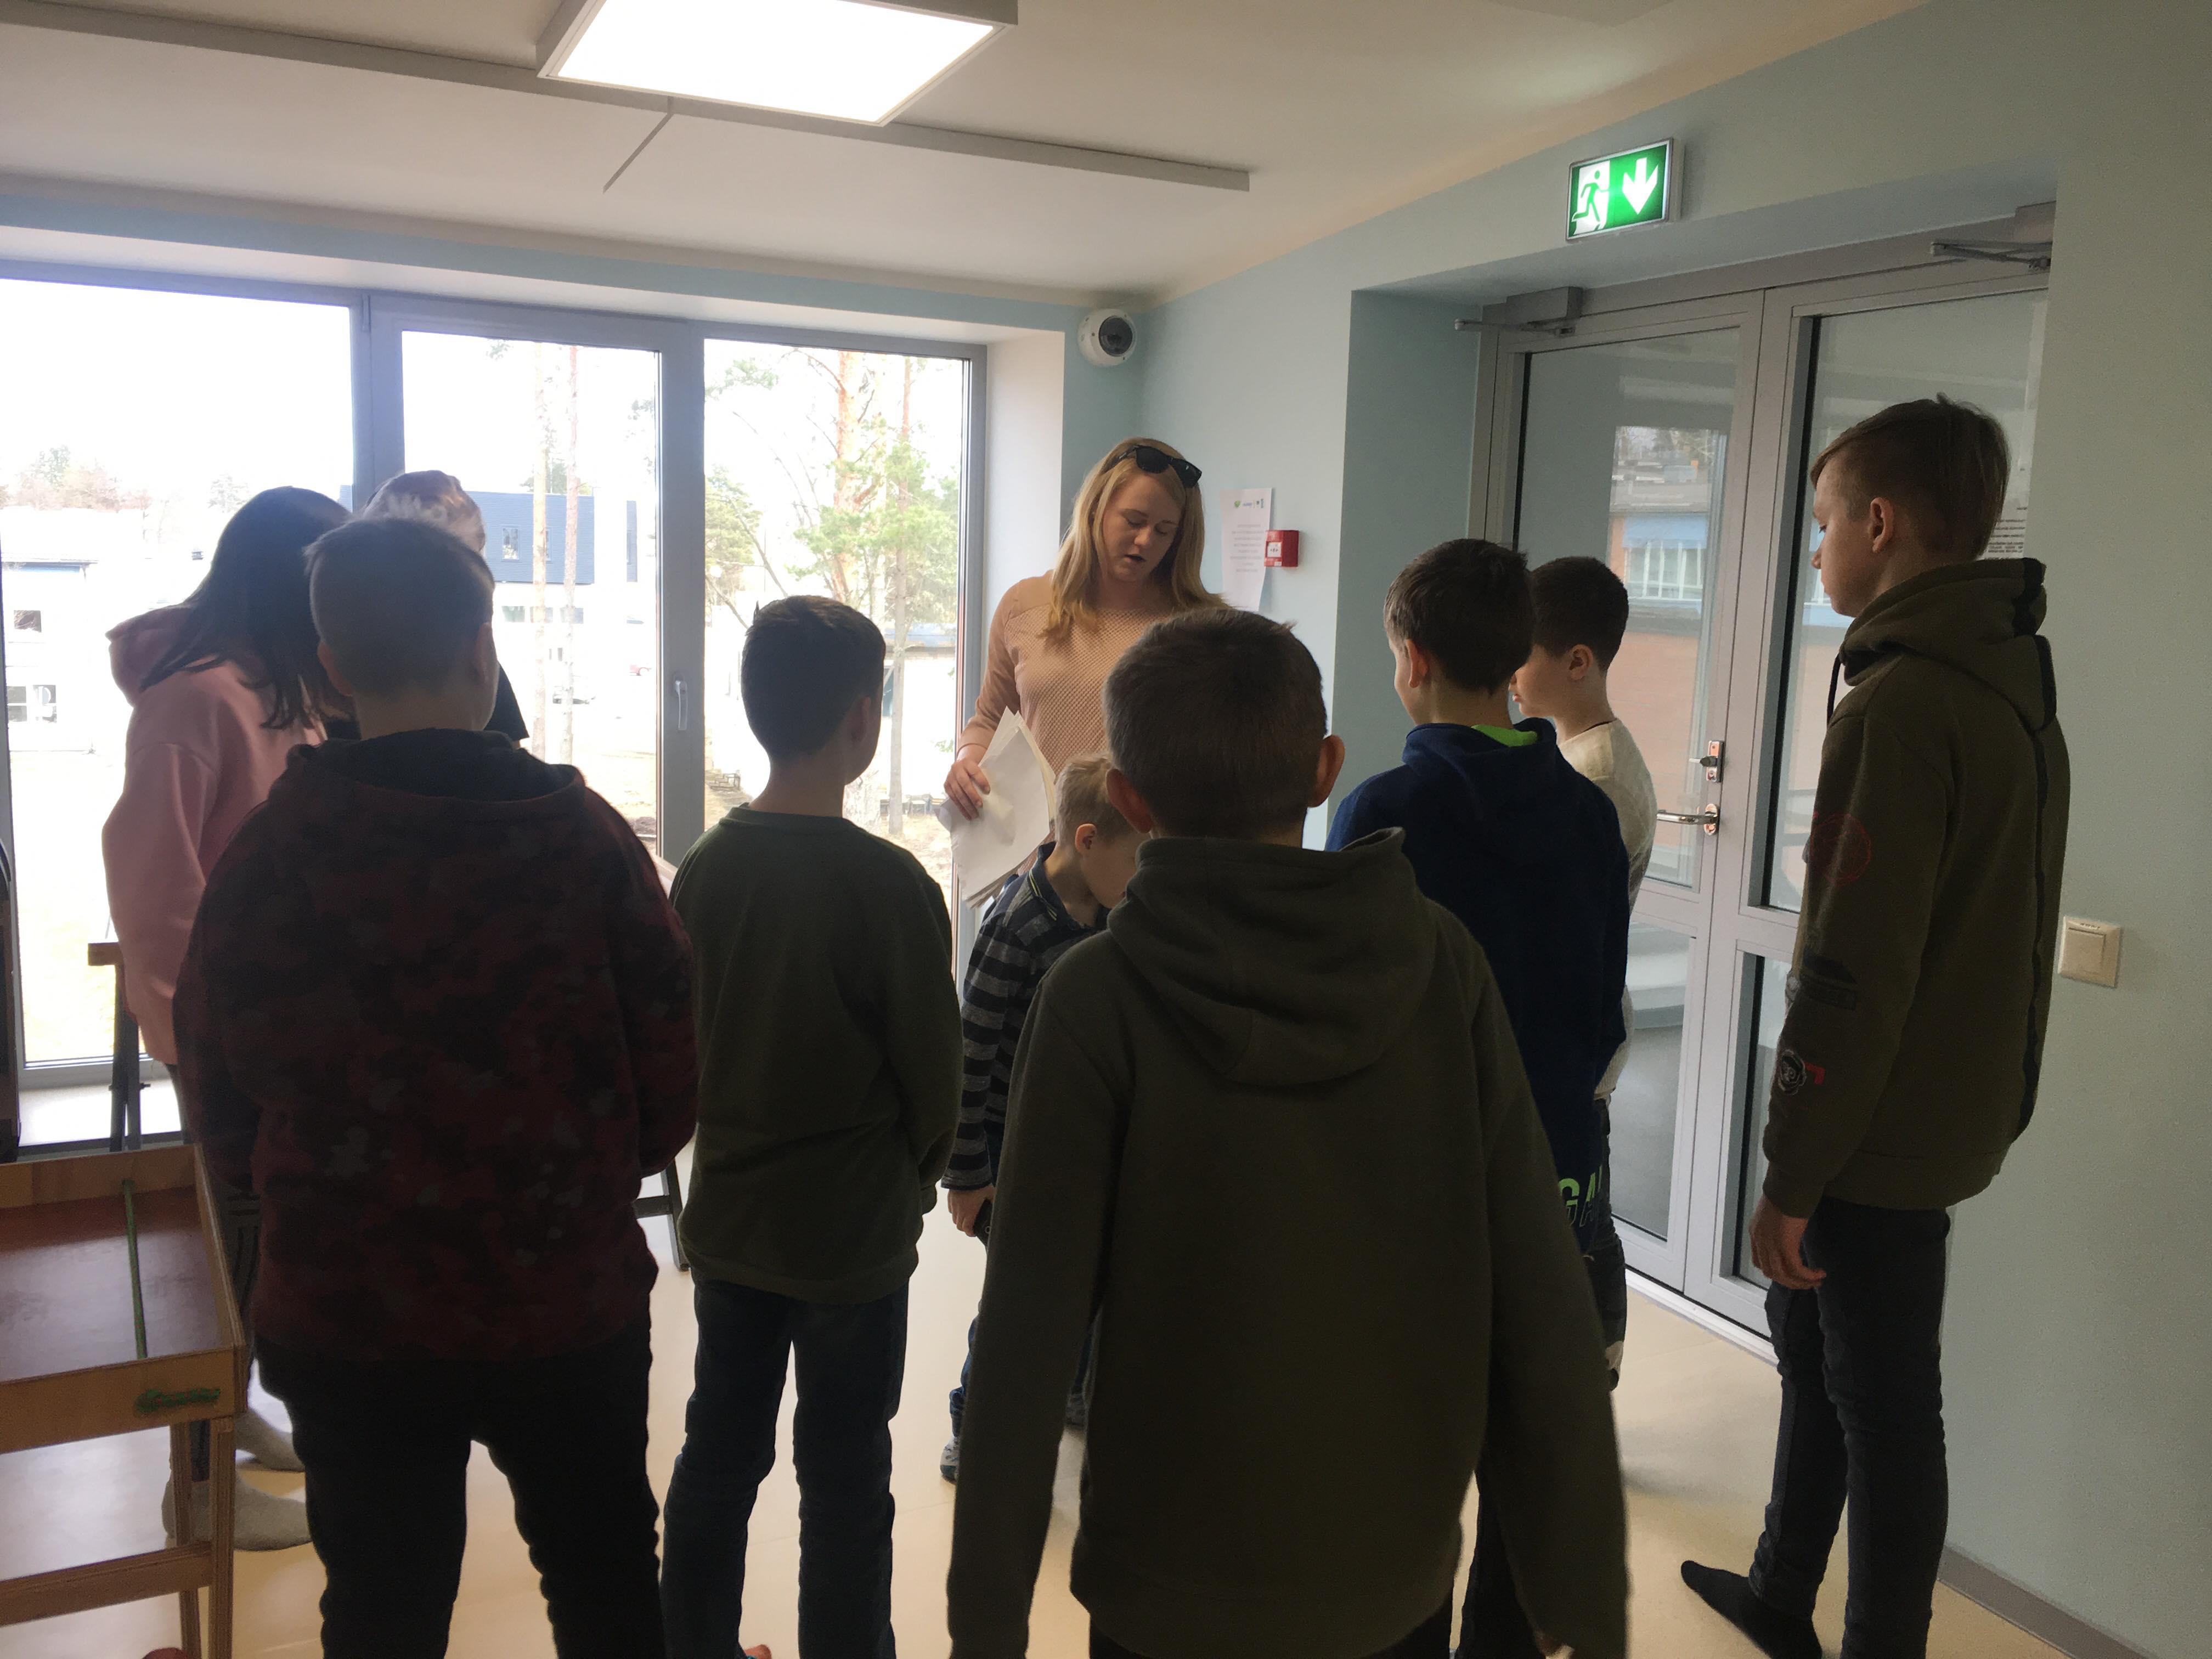 koolitus training course nyh italy itaalia estonia eesti erasmus teamwork